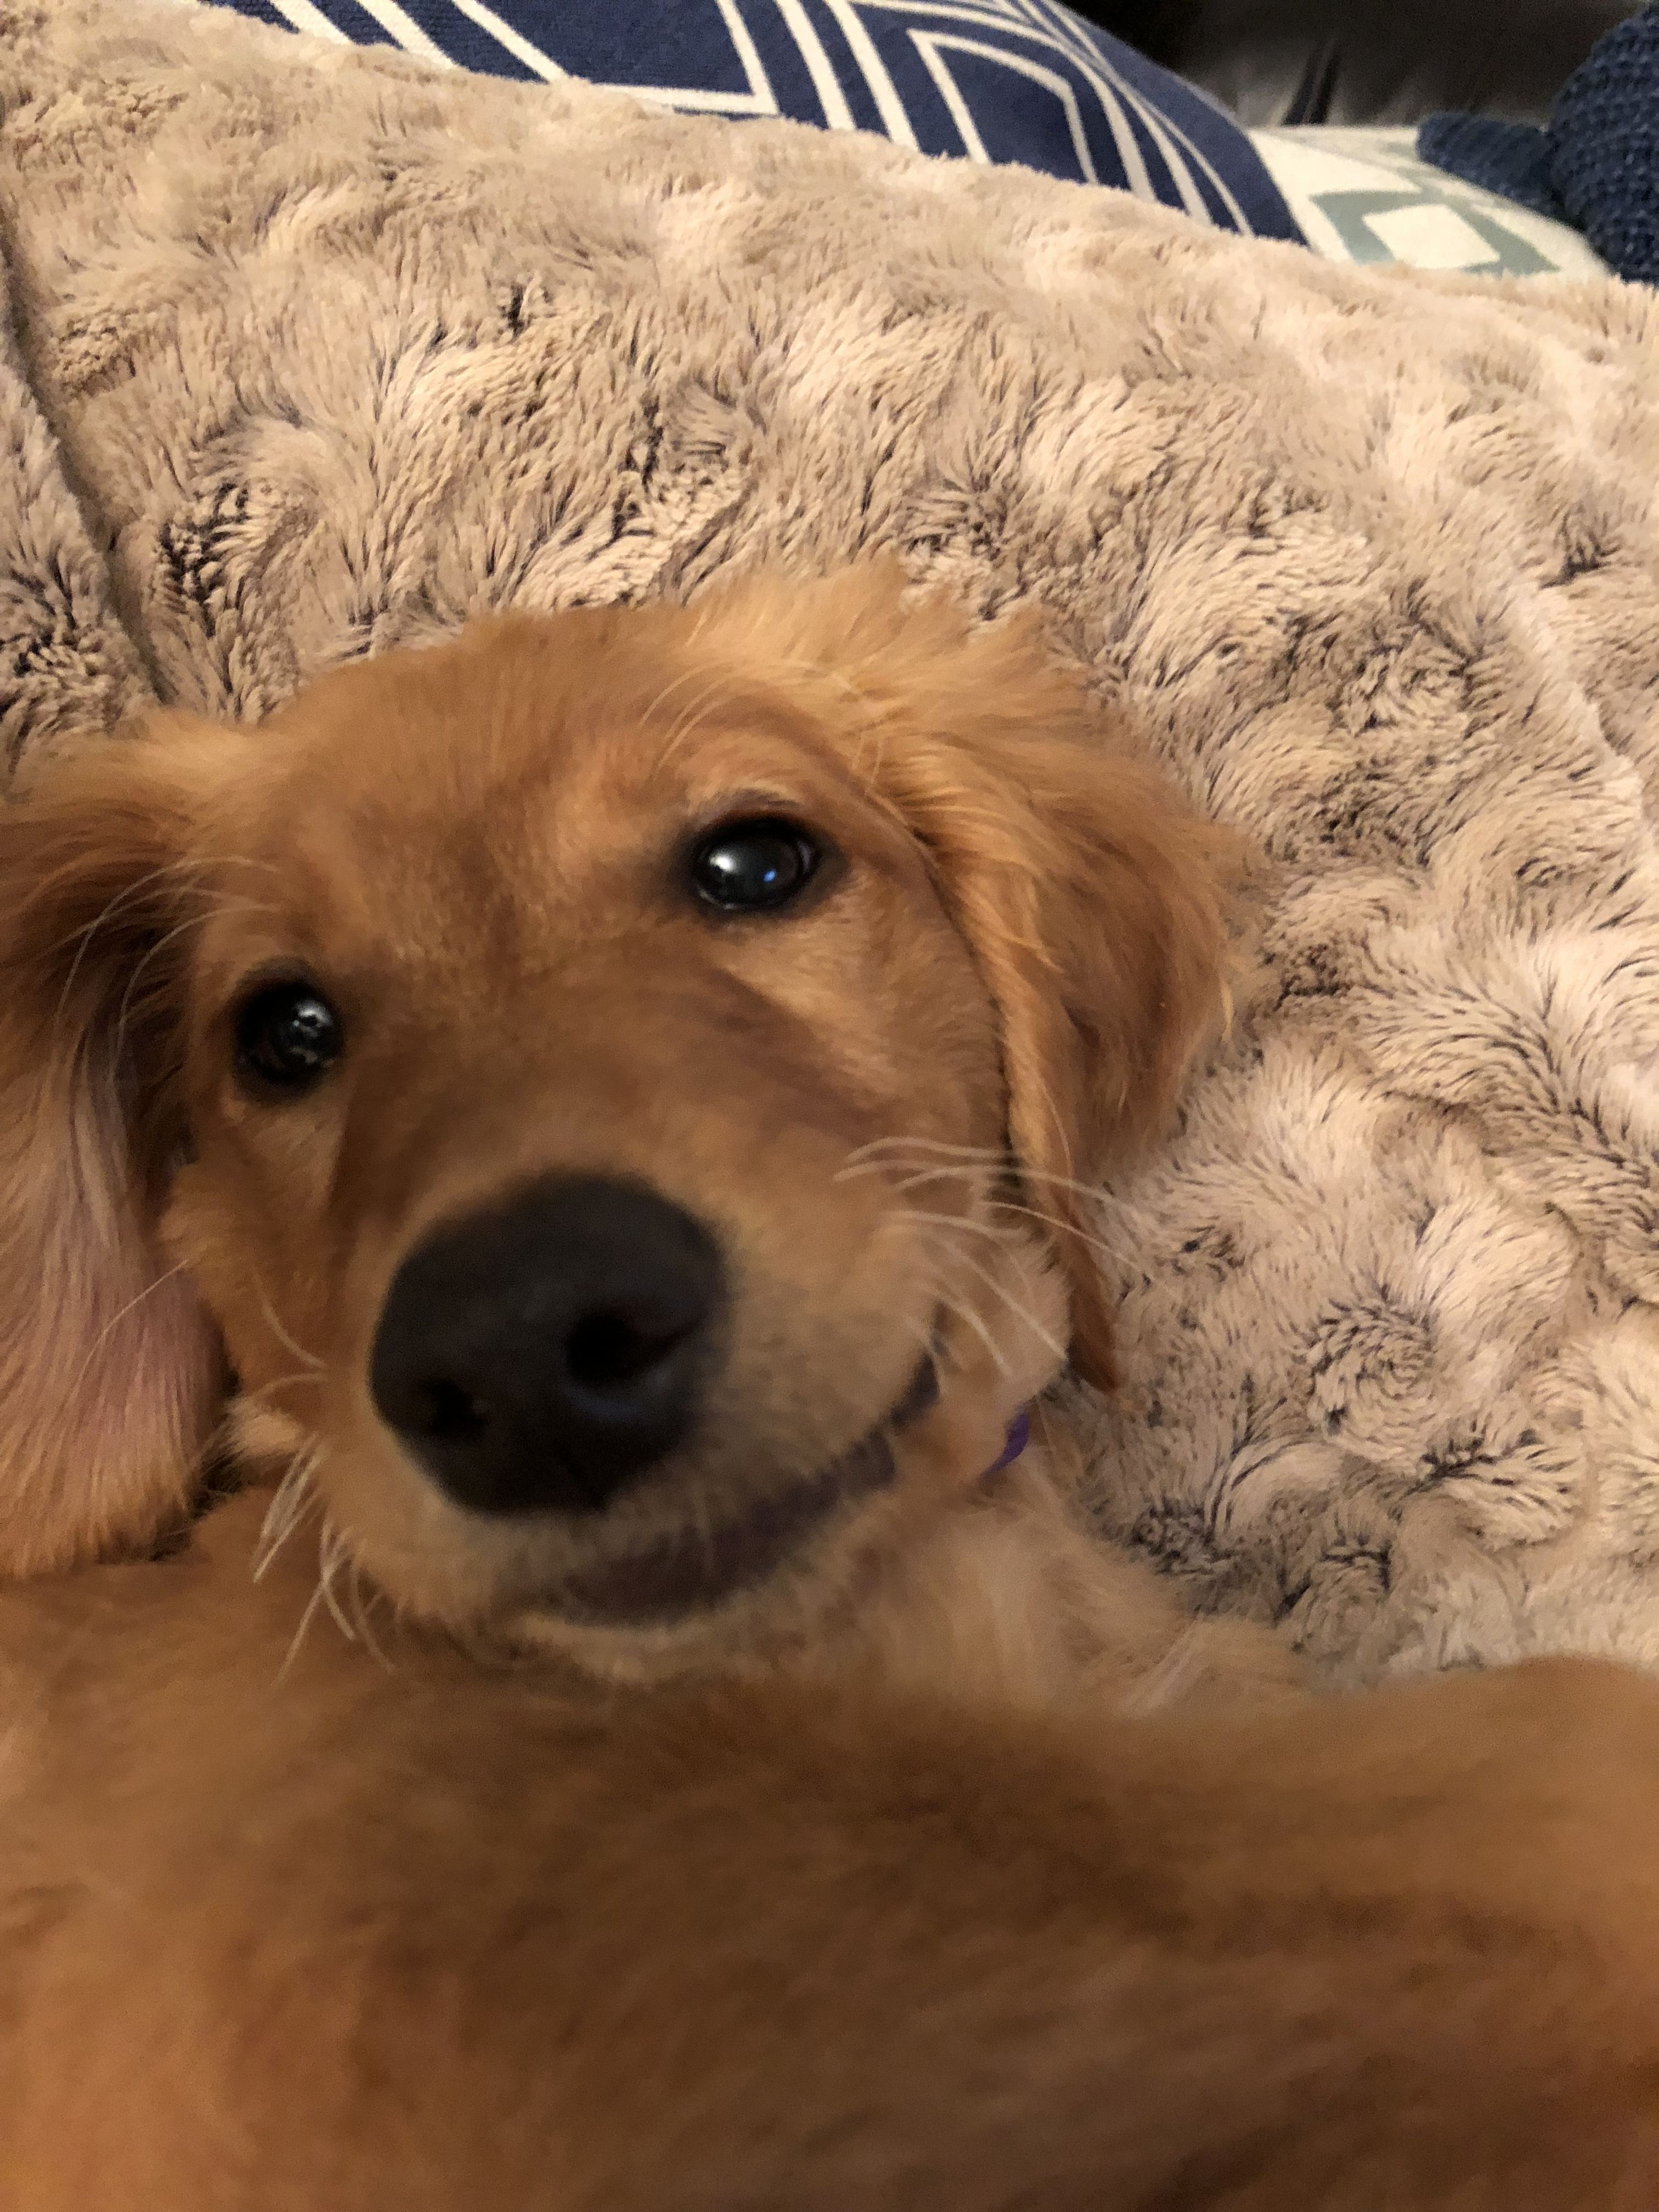 Pin by Kari Hunter on Zoey Golden retriever, Retriever, Dogs